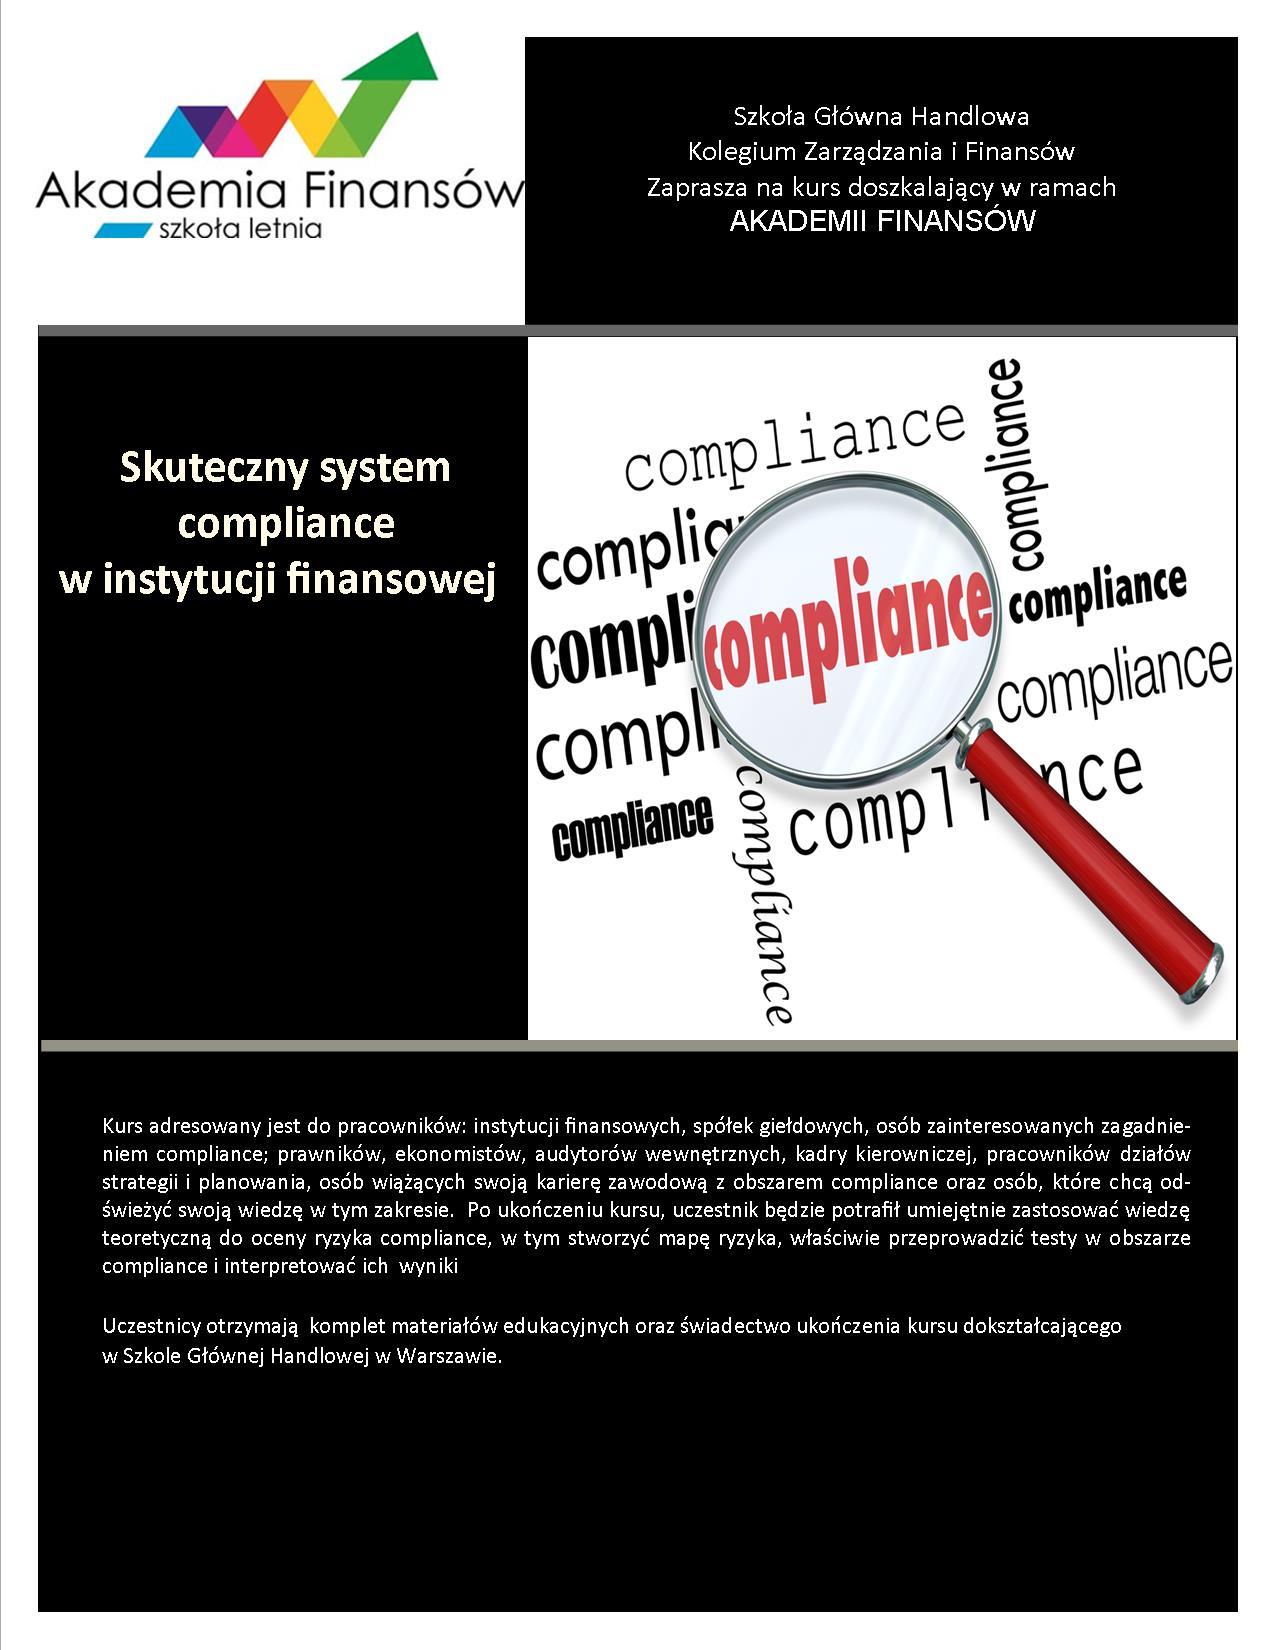 skuteczny system compliance sgh